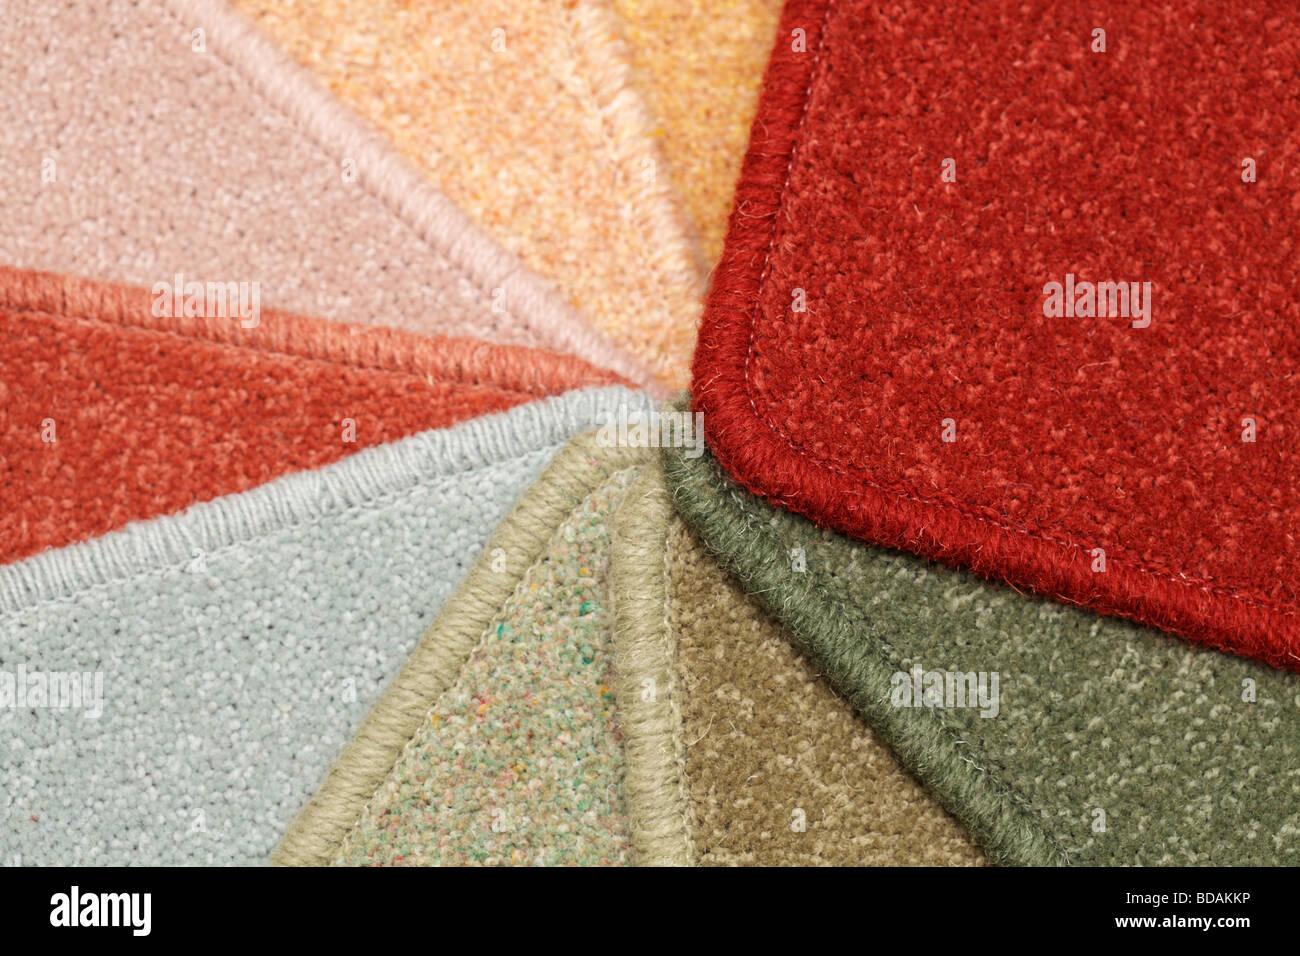 carpet - Stock Image